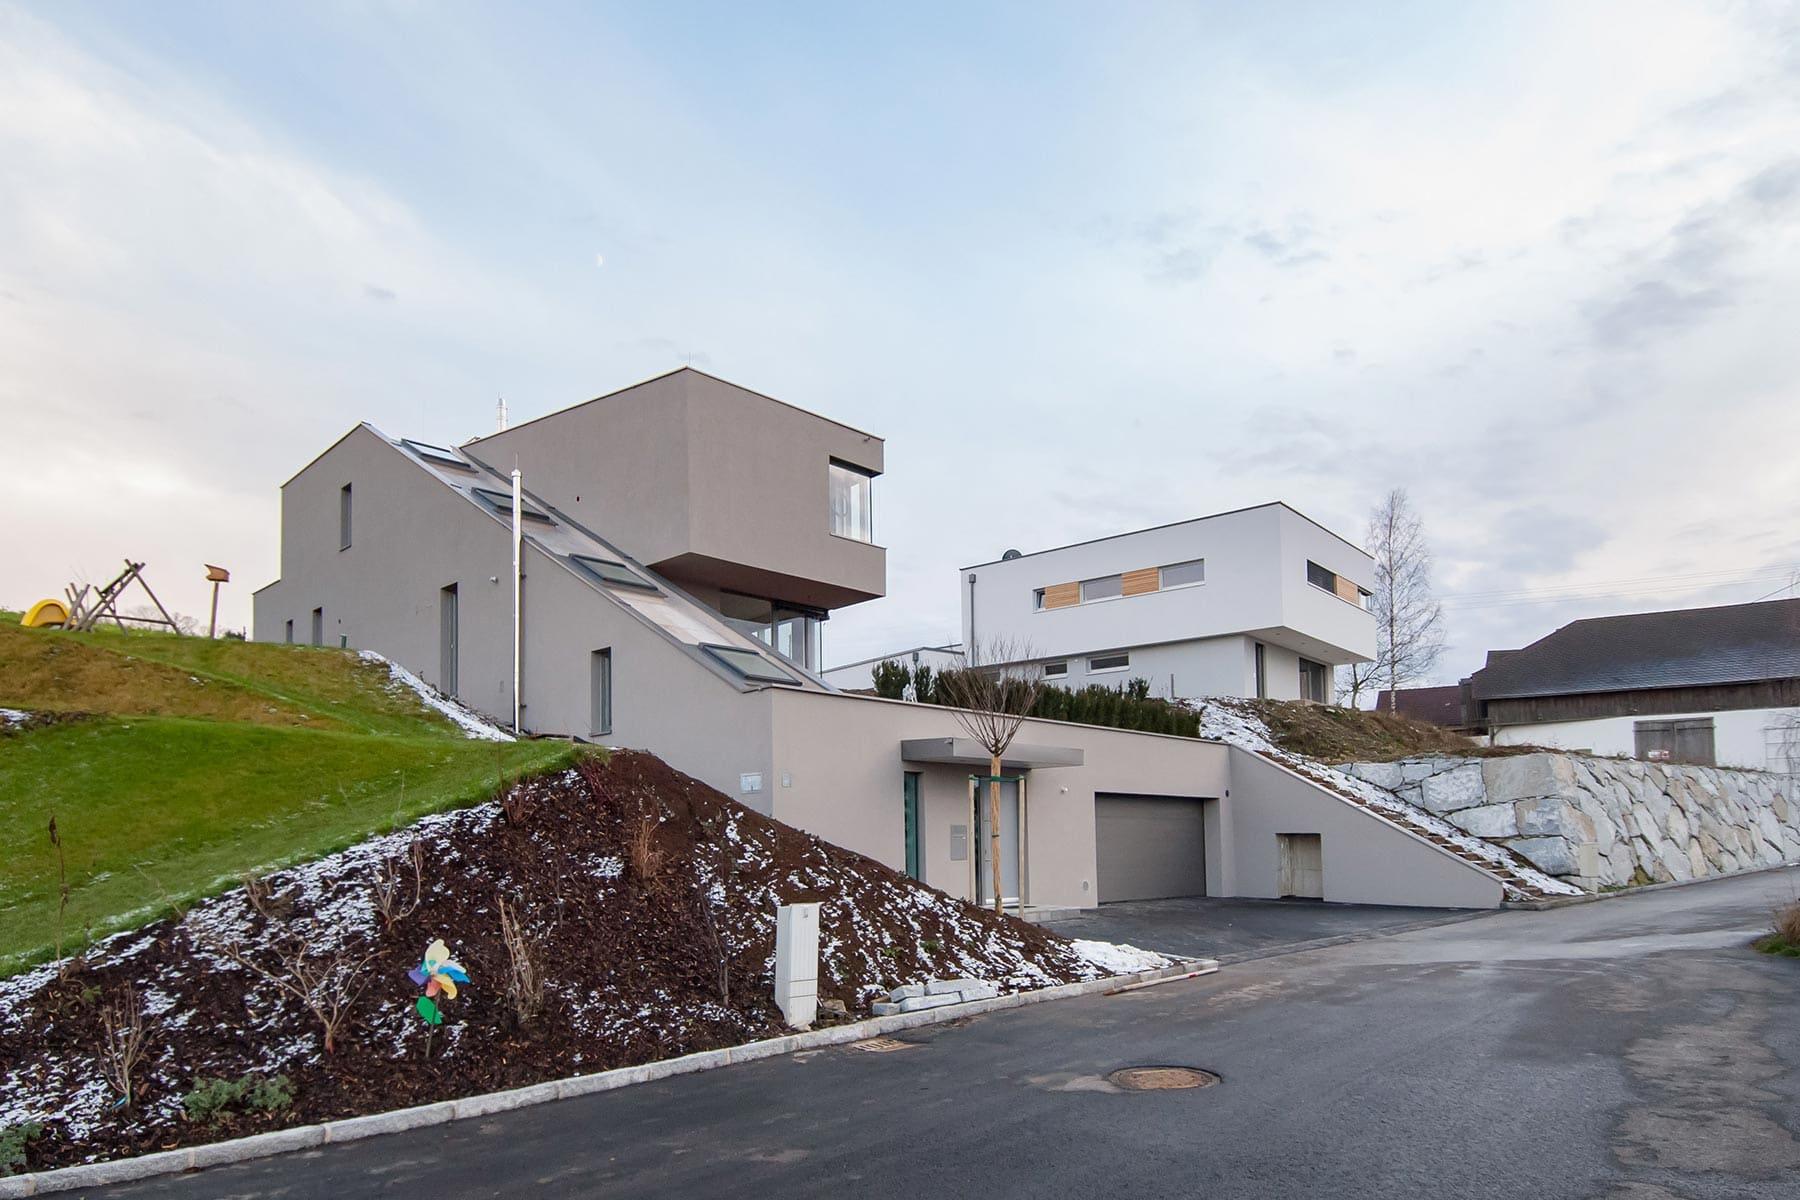 HAUS, Haus am Berg, hanghaus, haus am hang, architektur, architektenhaus, gramastetten